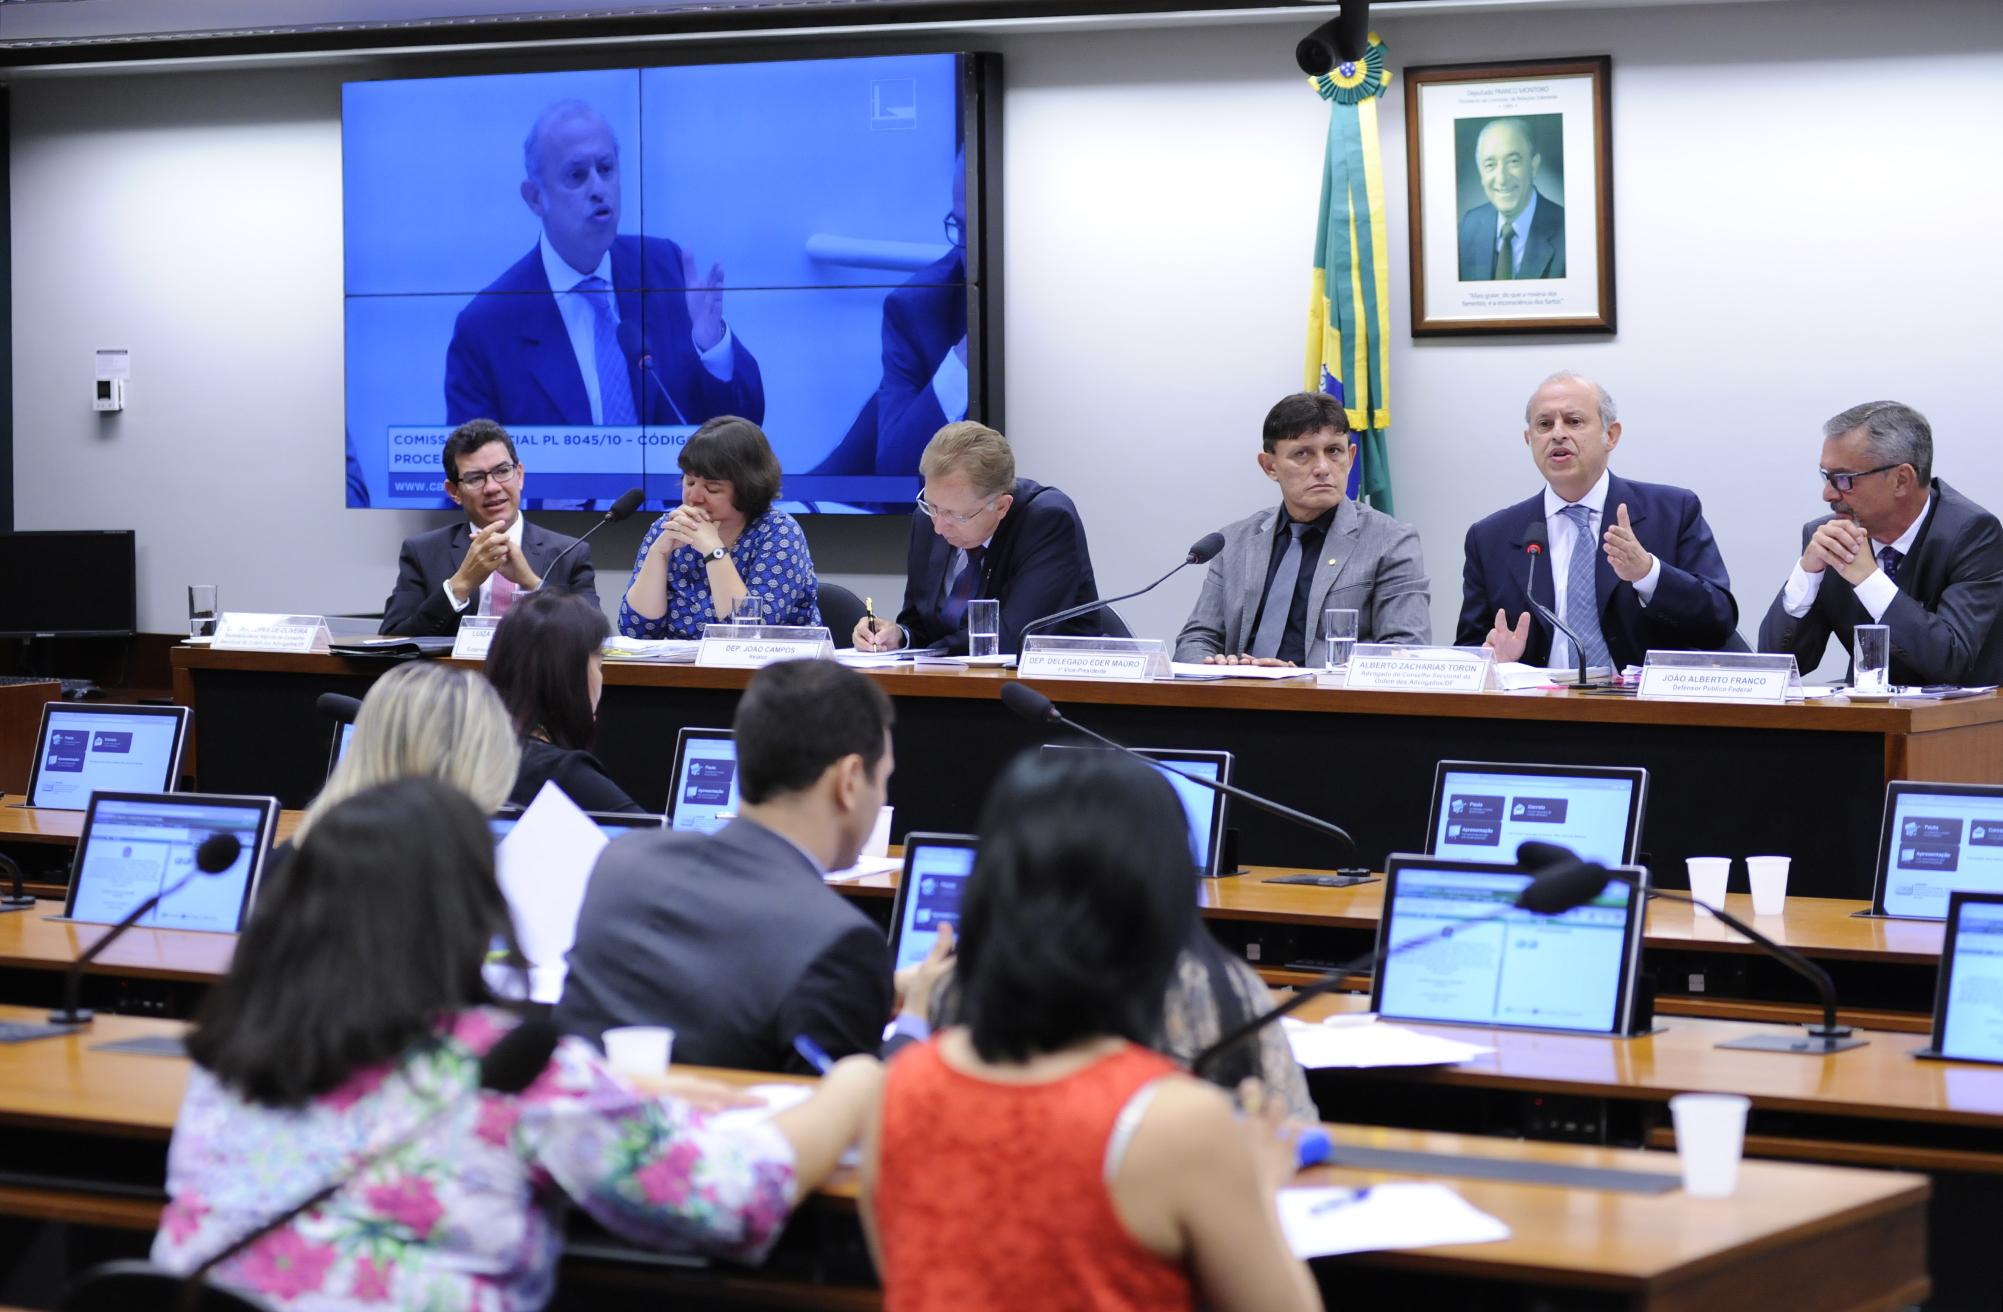 http://www.camara.gov.br/internet/bancoimagem/banco/img201605101821206608047.jpg